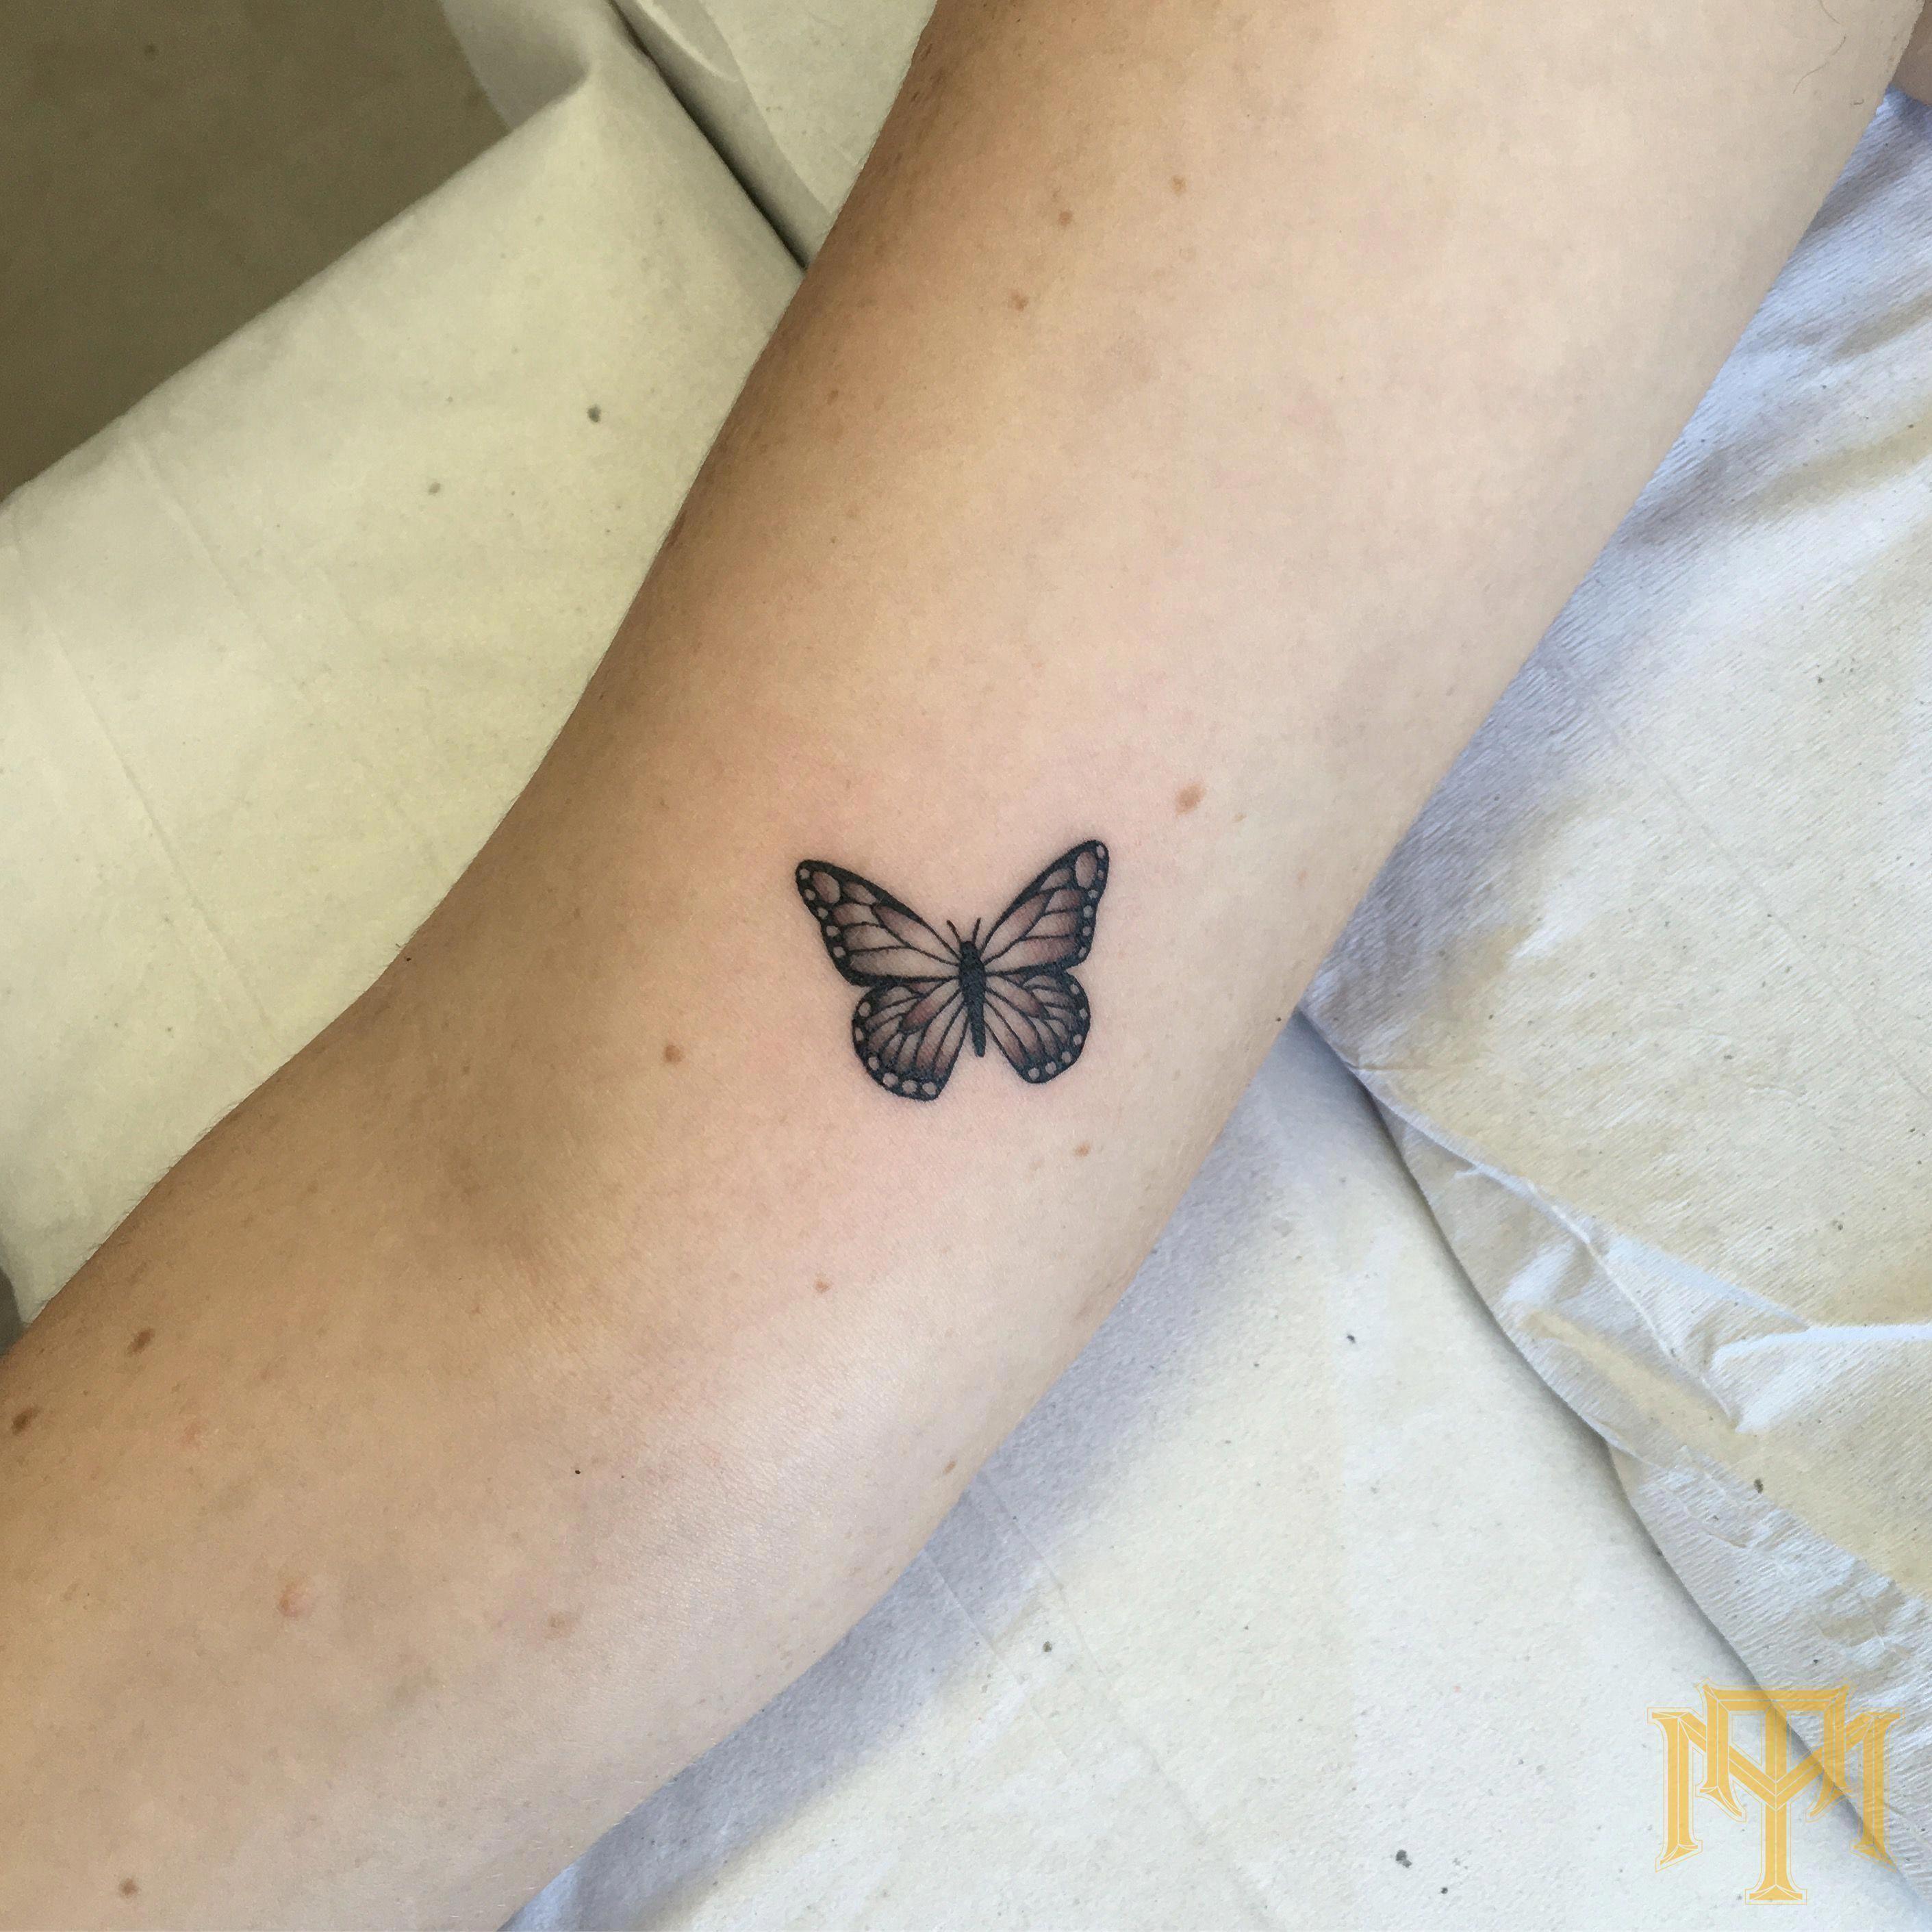 minimalist space tattoo Minimalisttattoos tattooideas